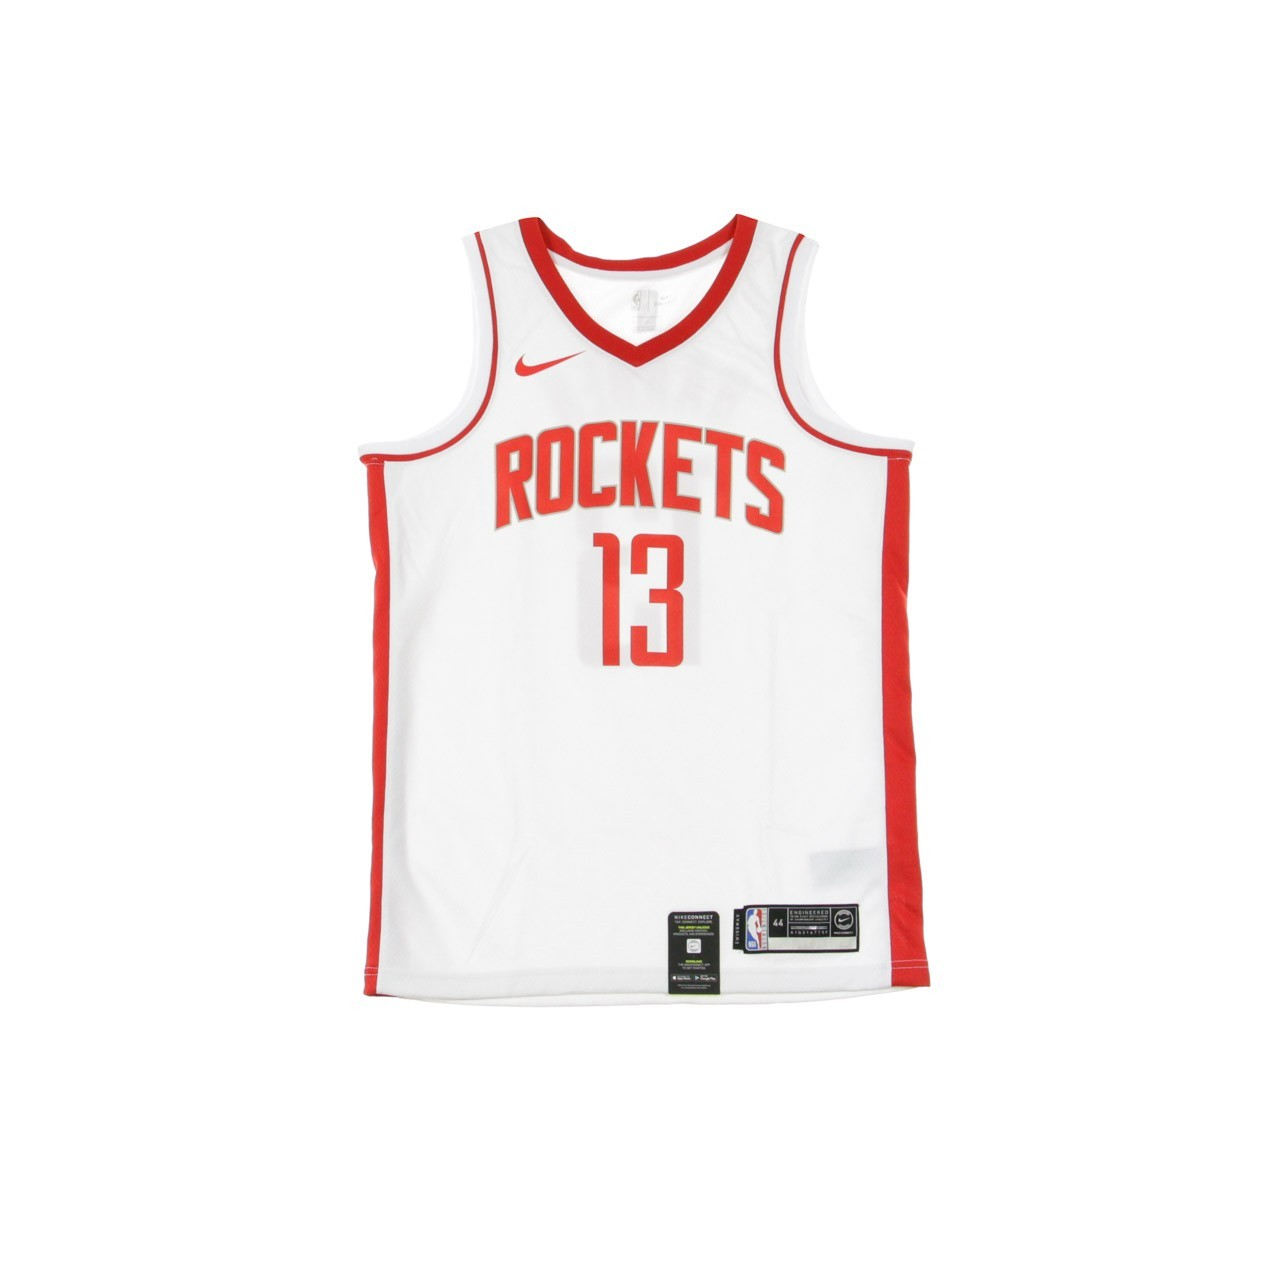 NIKE NBA NBA SWINGMAN JERSEY ASSOCIATION EDITION NO 13 JAMES HARDEN HOUROC HOME BV7990-100